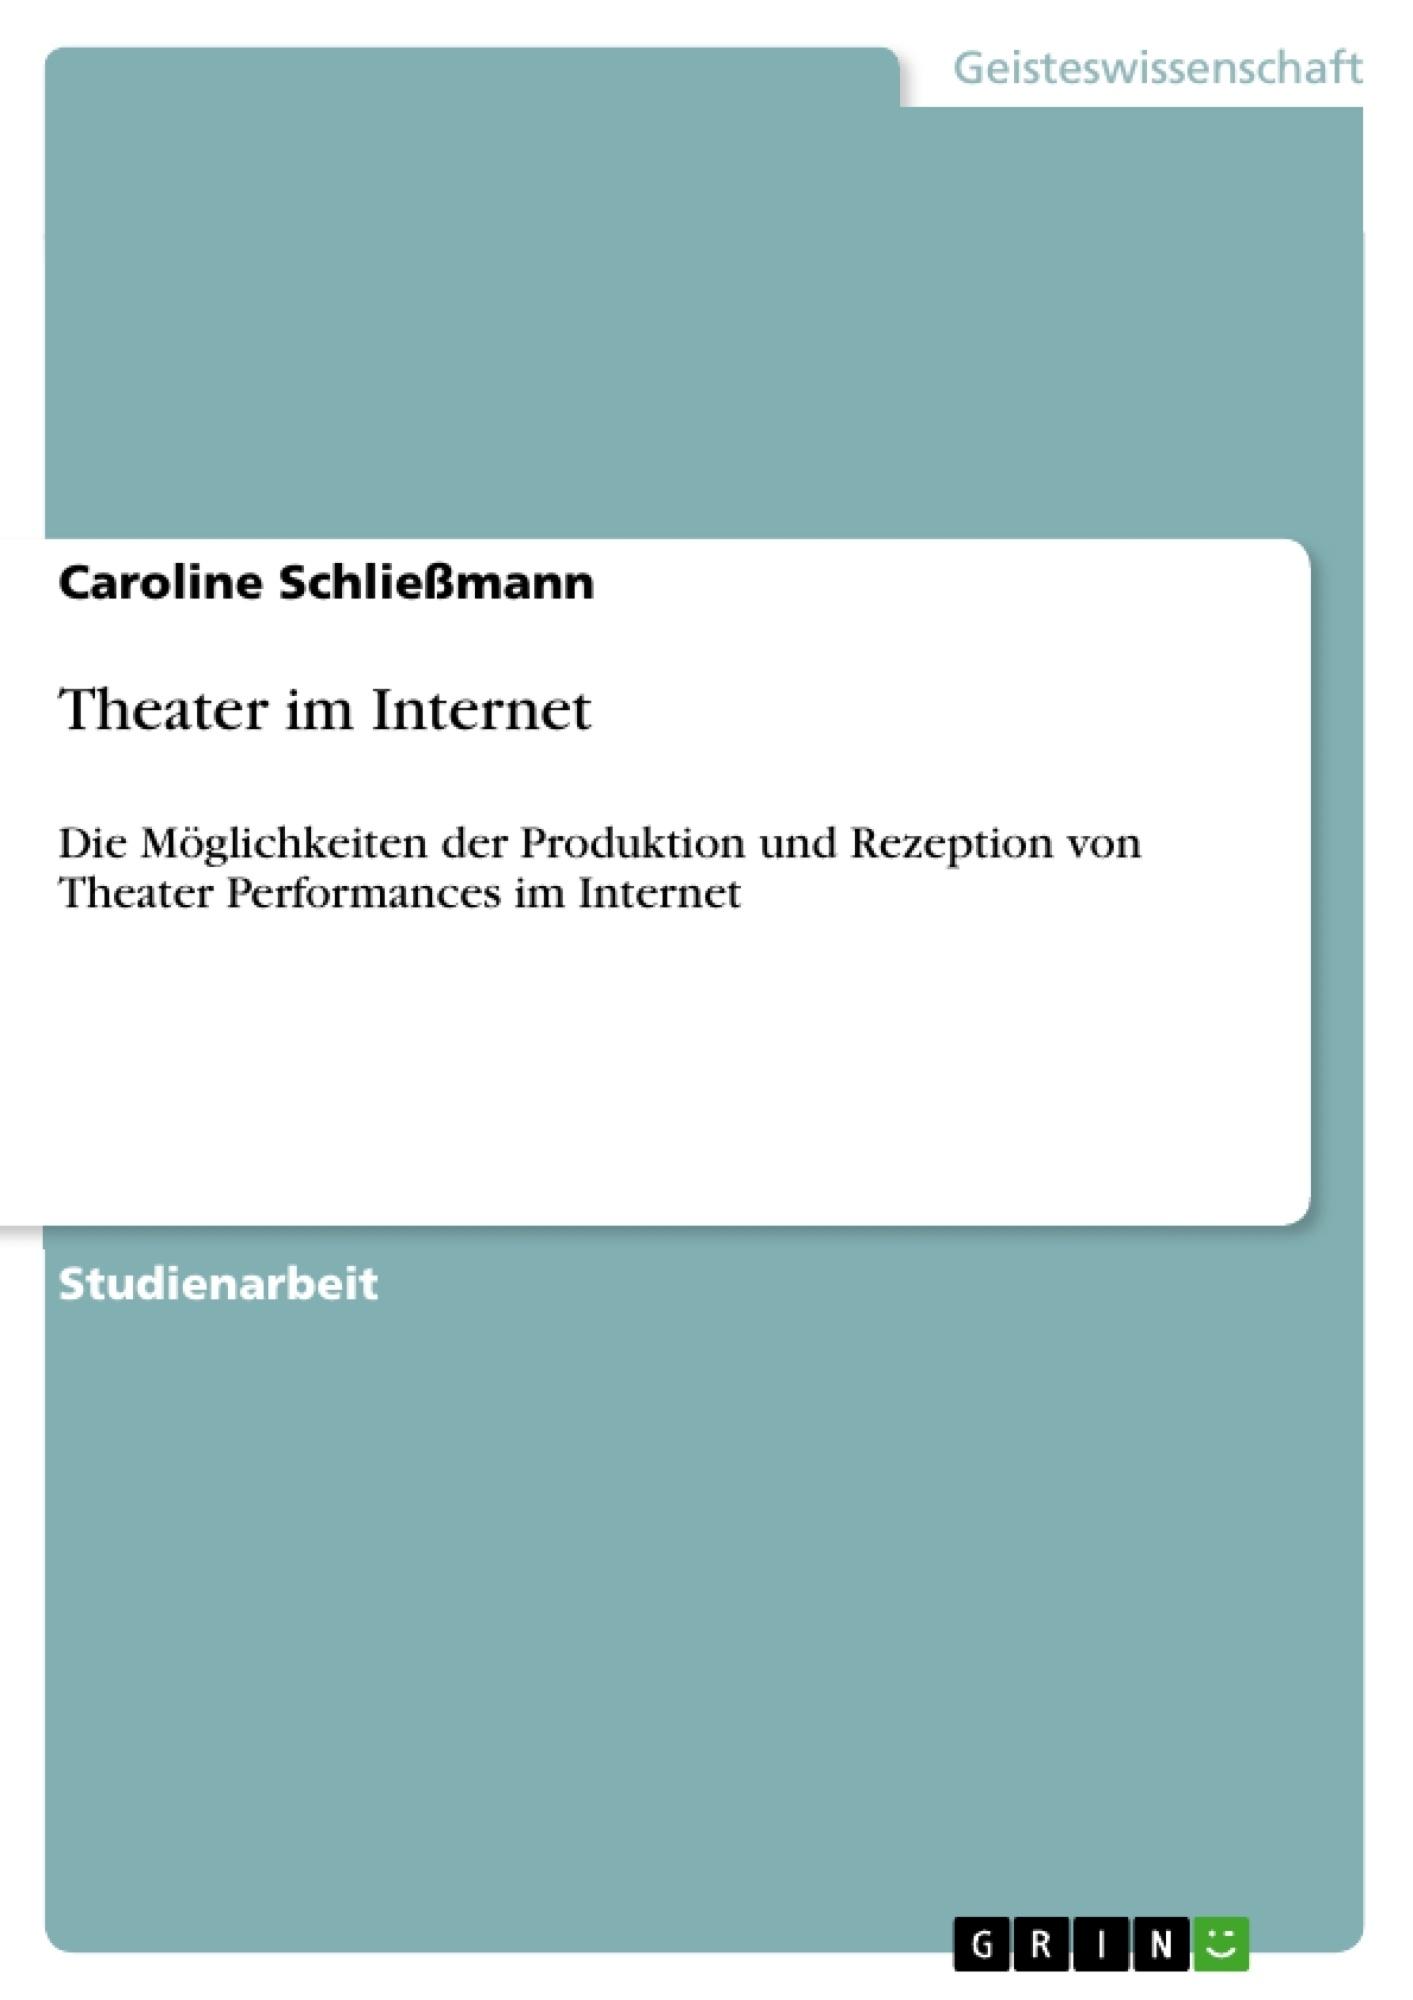 Titel: Theater im Internet